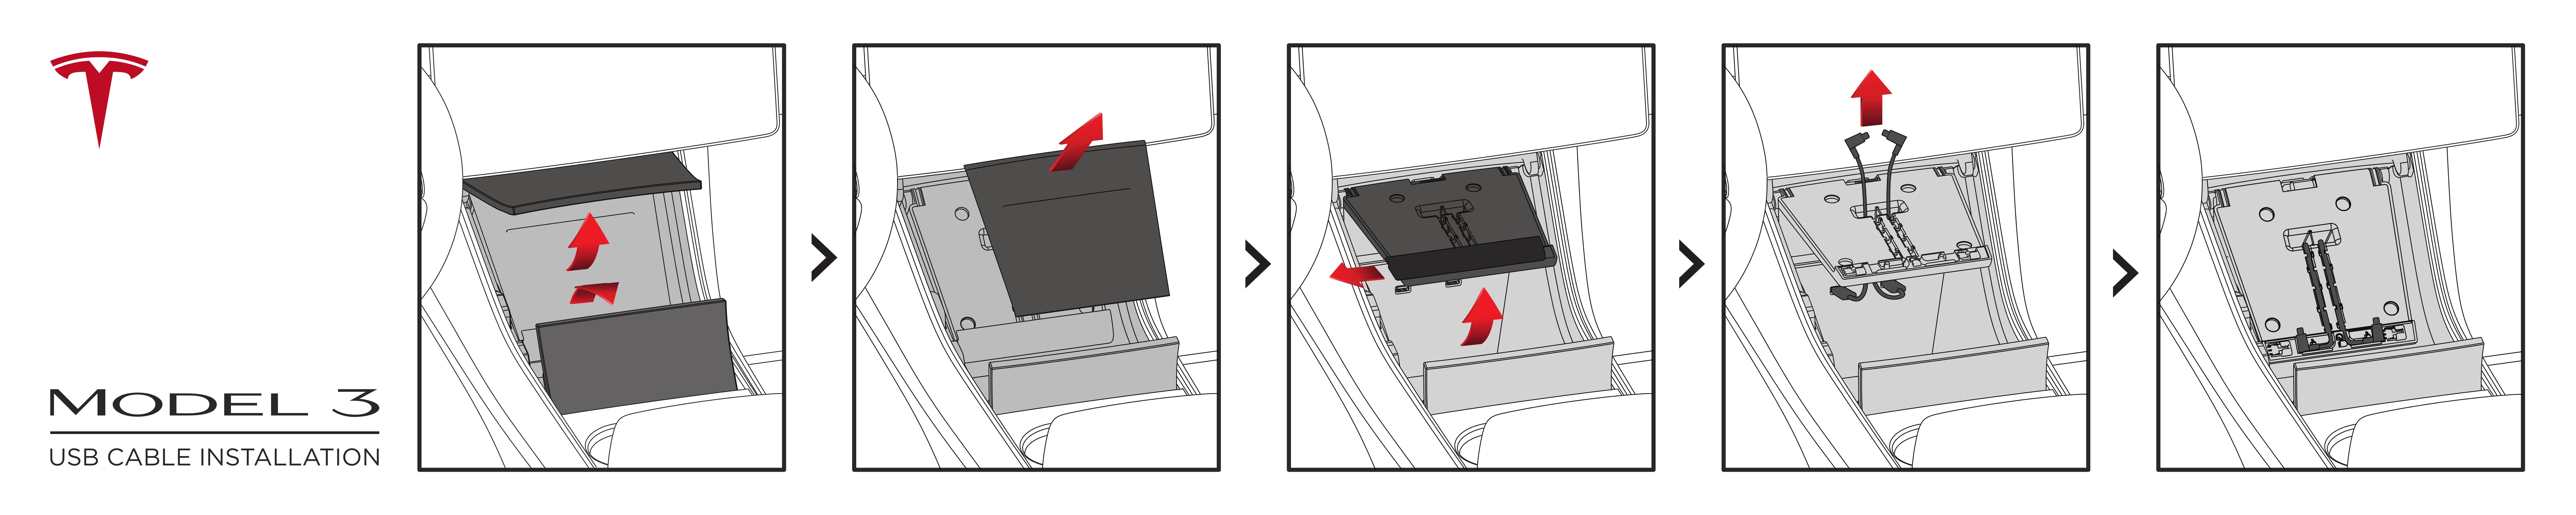 tesla-model-3-phone-dock-installation